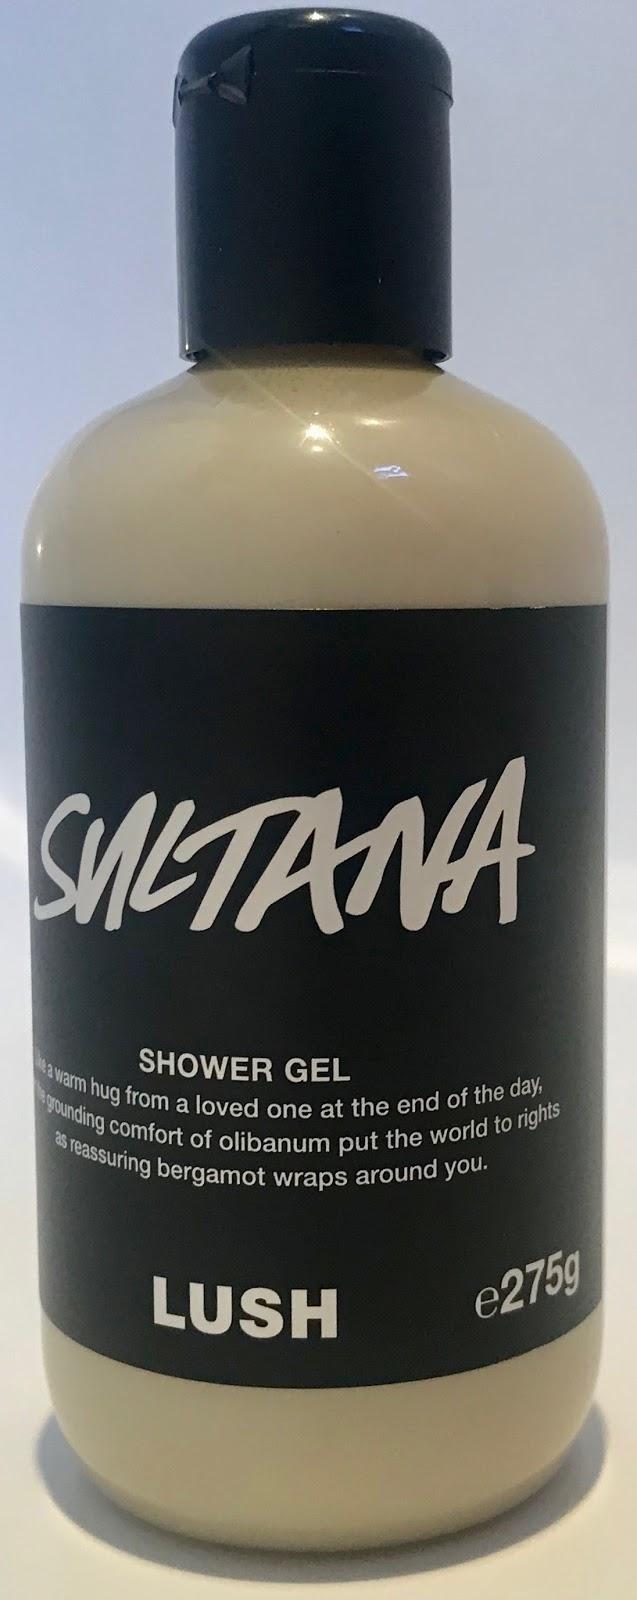 All Things Lush Uk Sultana Shower Gel